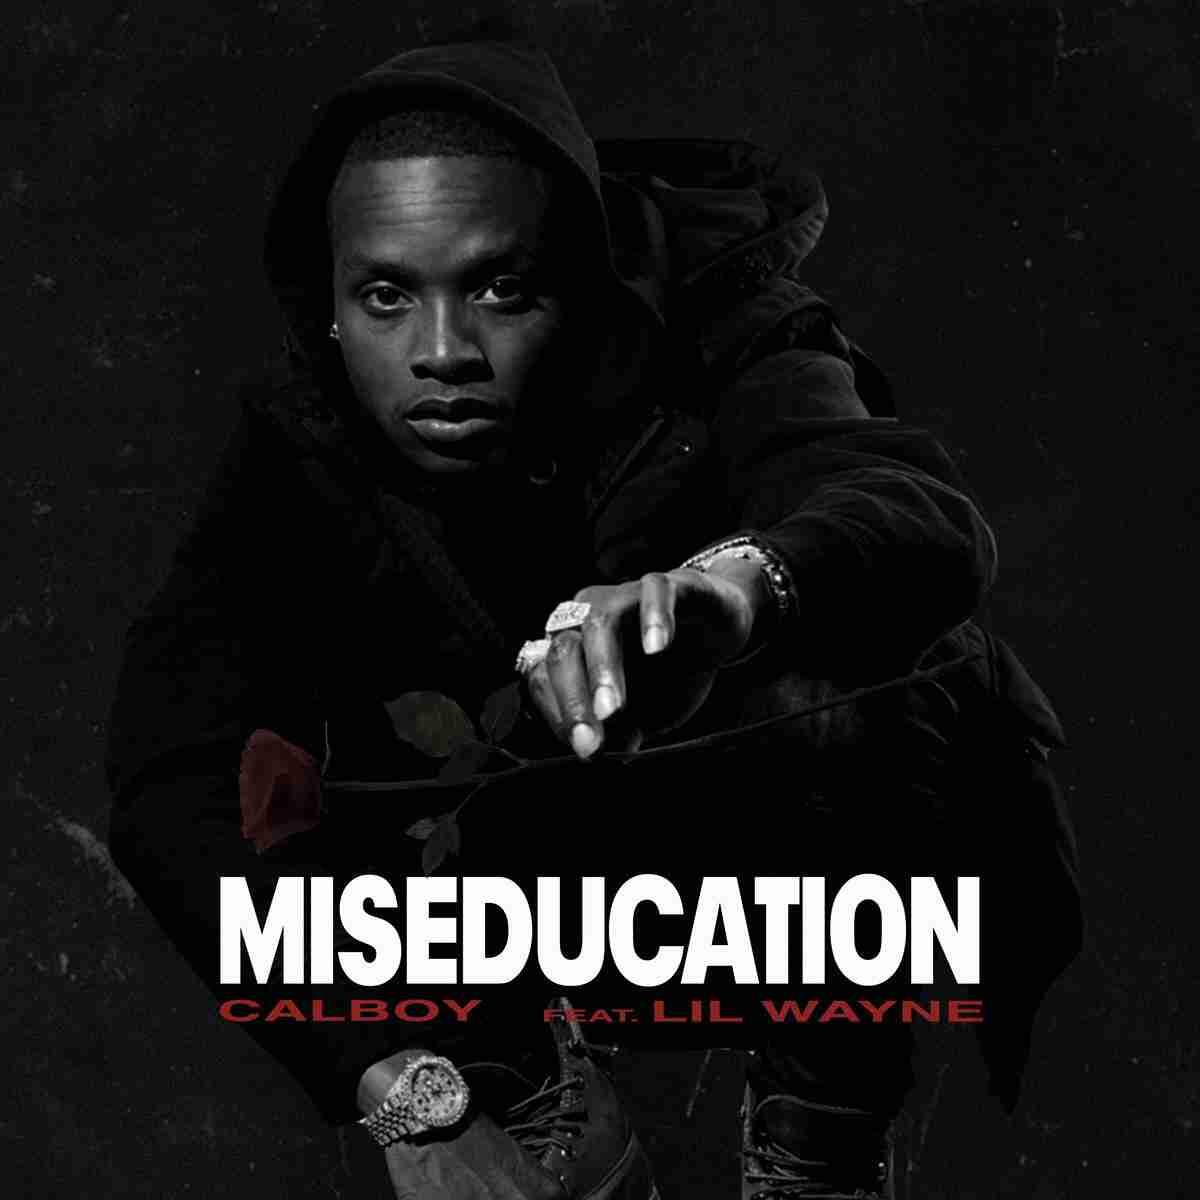 Calboy - Miseducation Ft. Lil Wayne